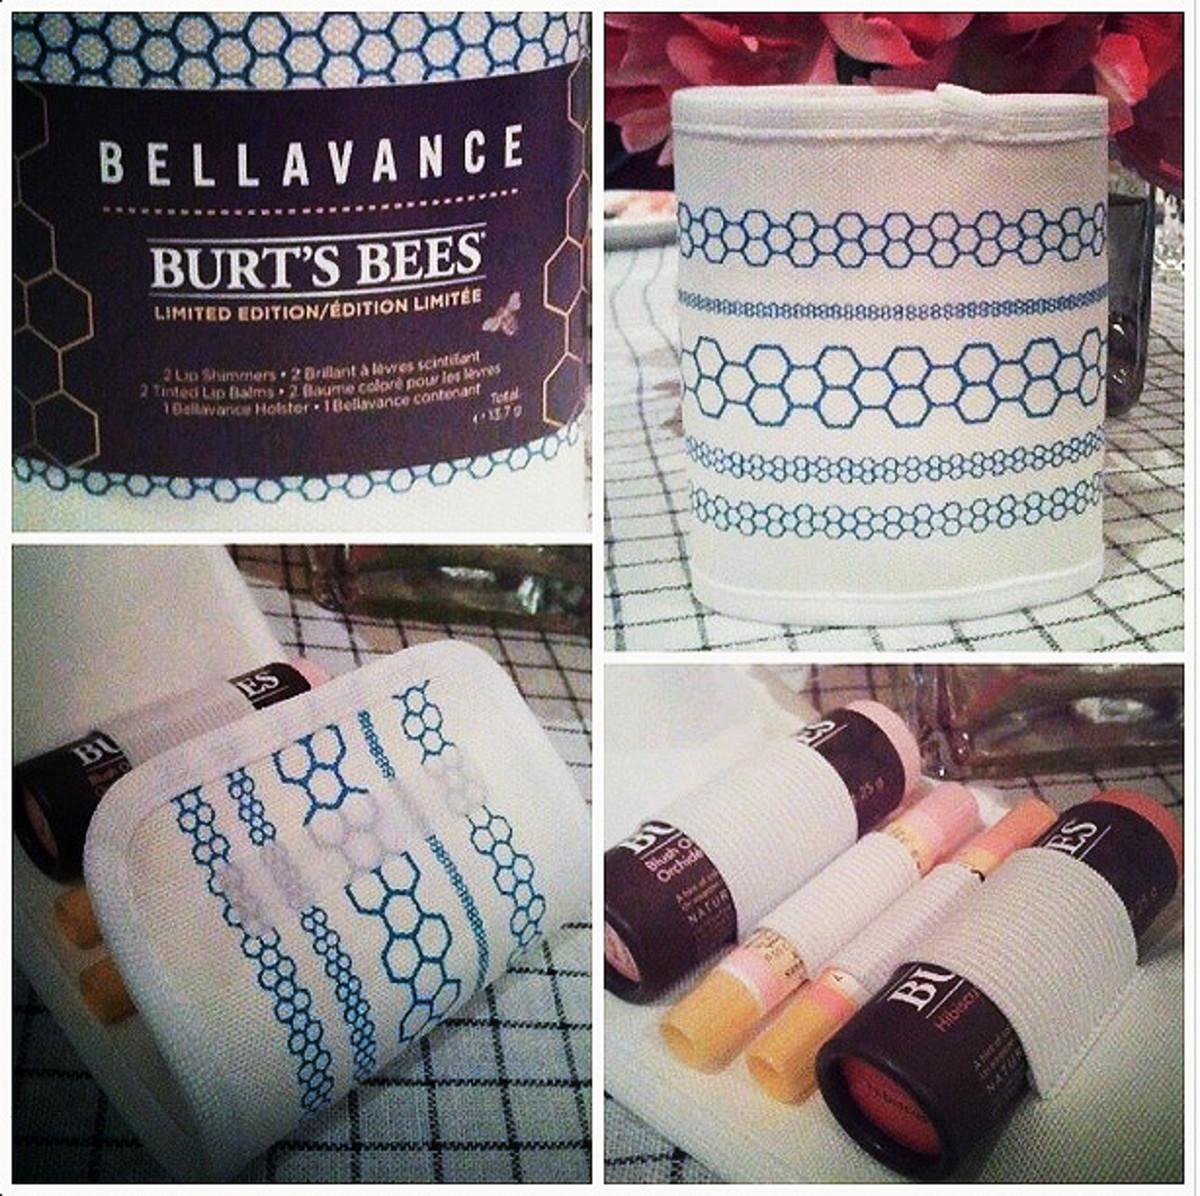 Bellavance Burt's Bees Limited Edition lip-balm roll